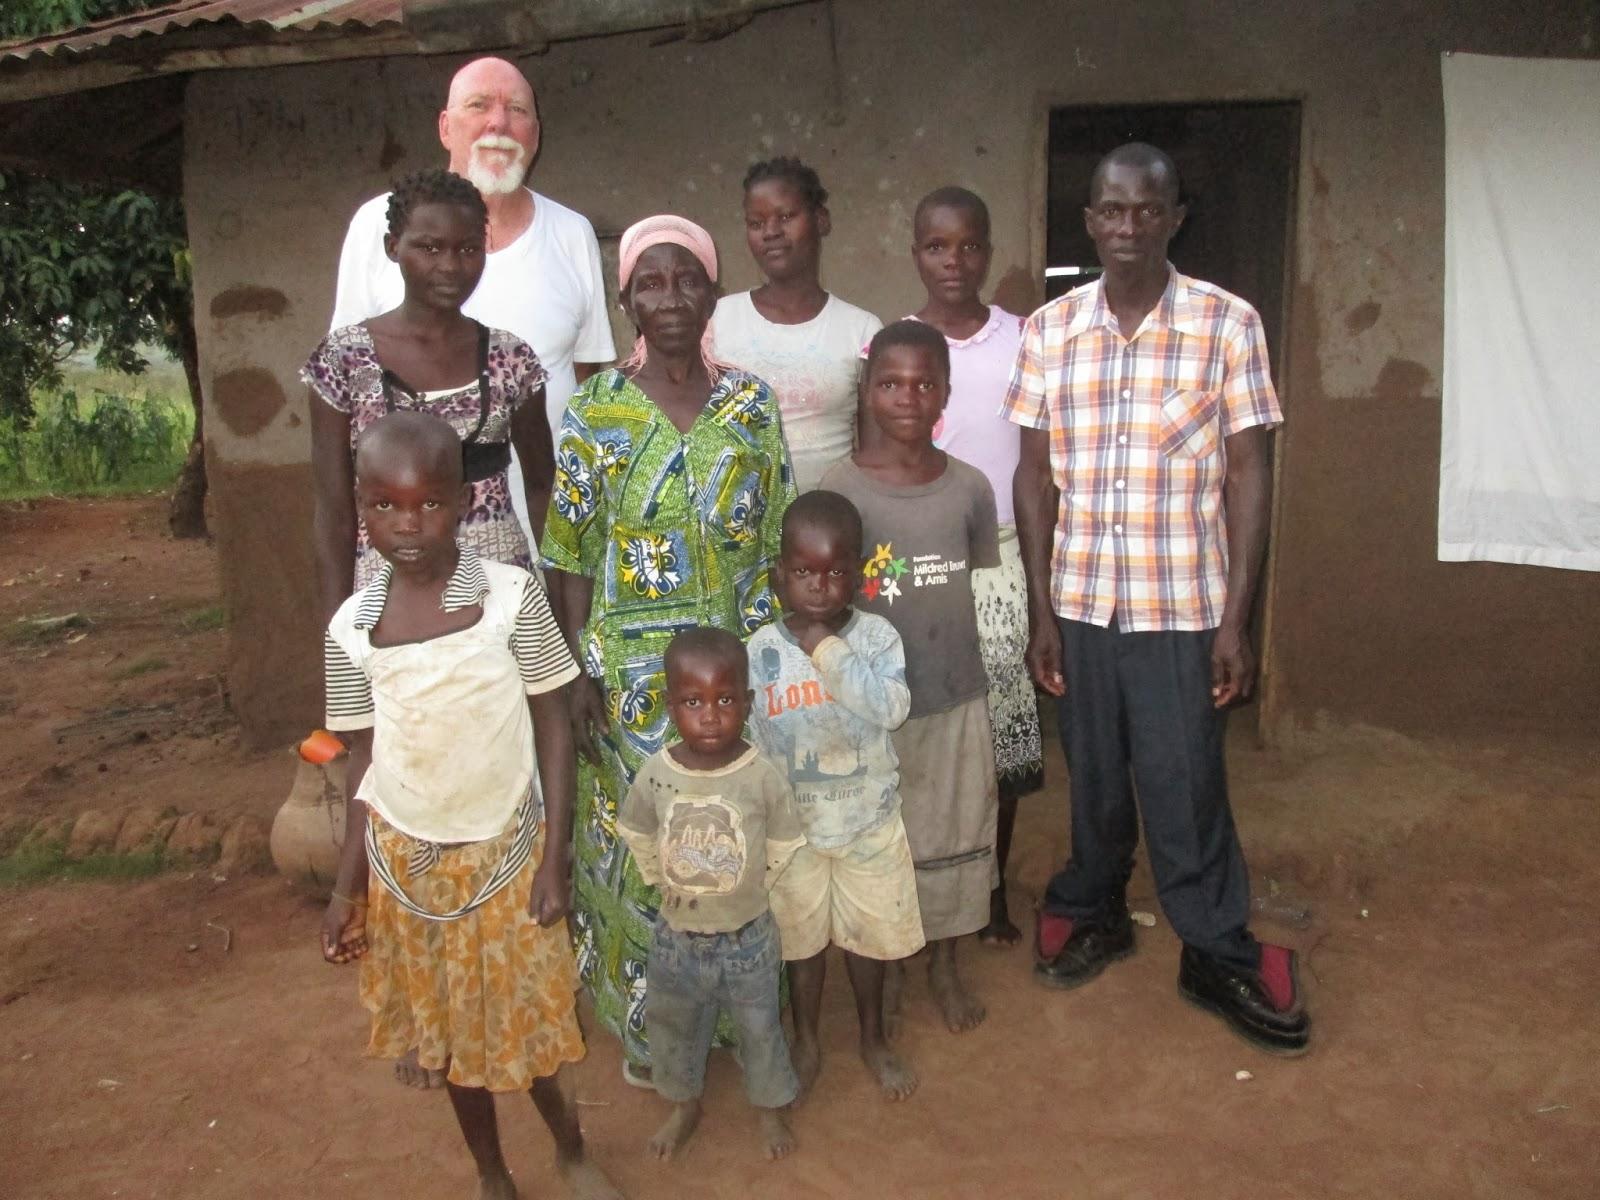 family photo----Jjaja [grandmother] center----Jimmy Right